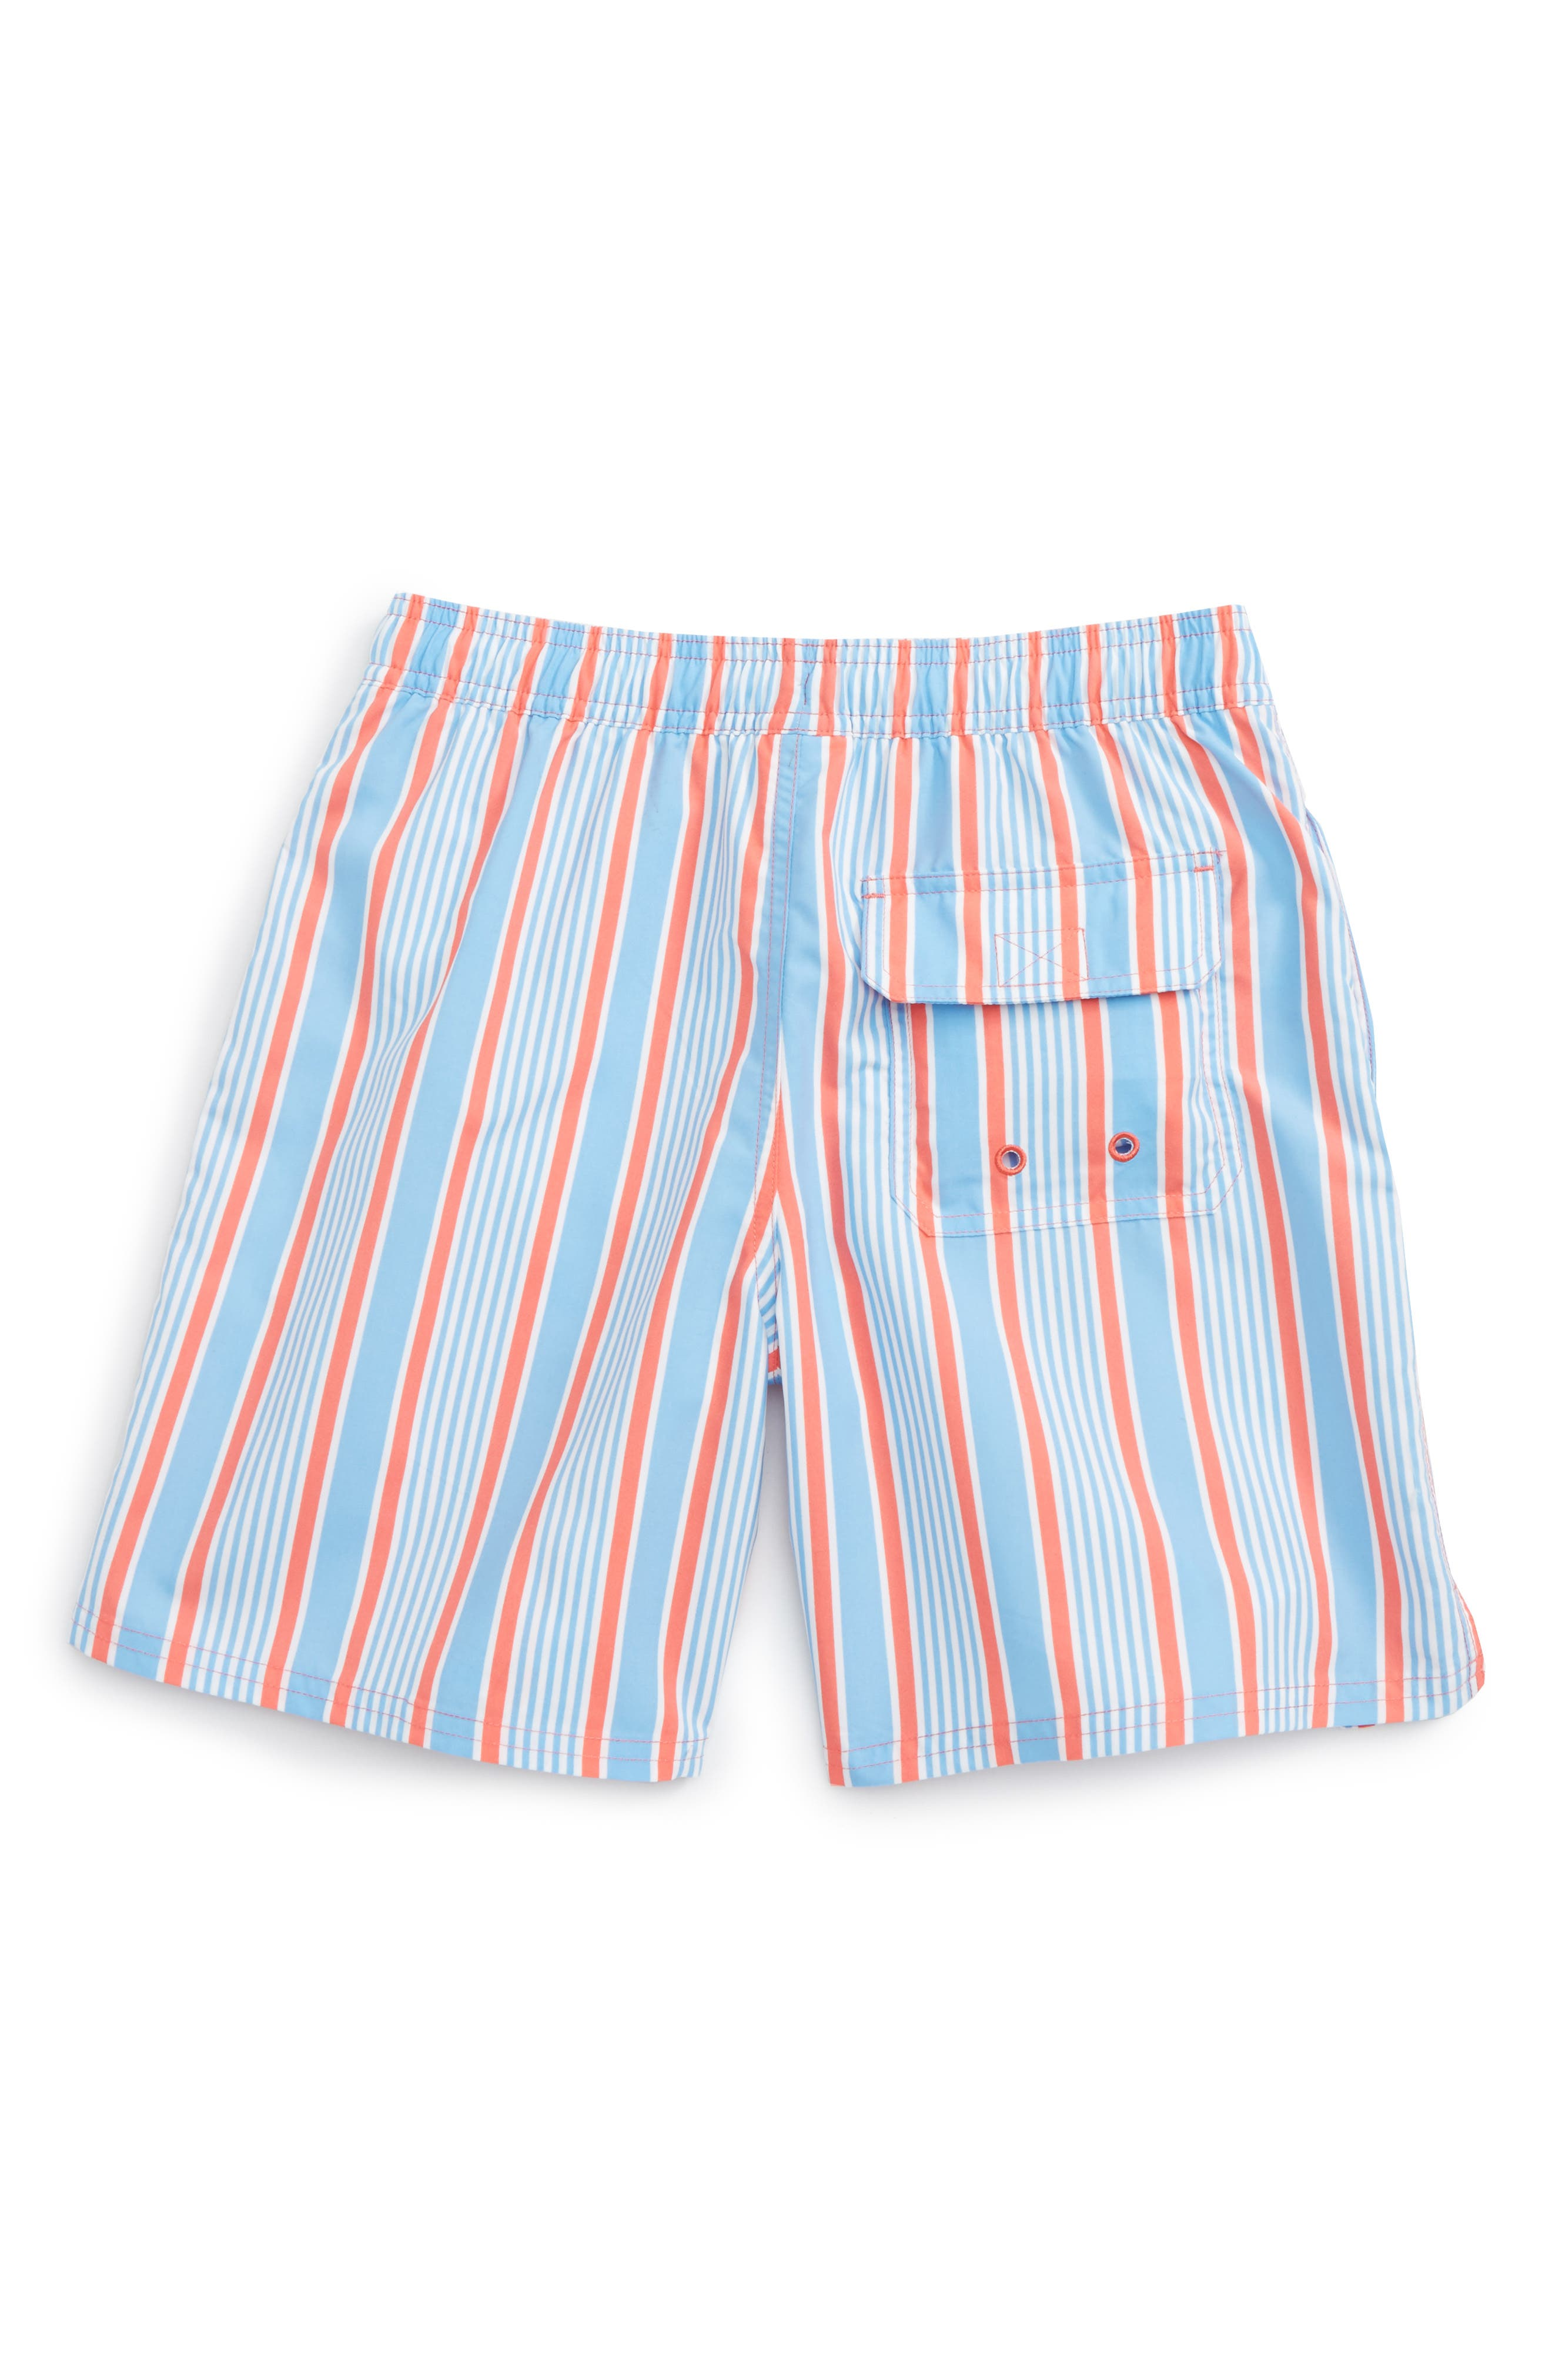 VINEYARD VINES Stripe Bungalow Swim Trunks, Main, color, 669